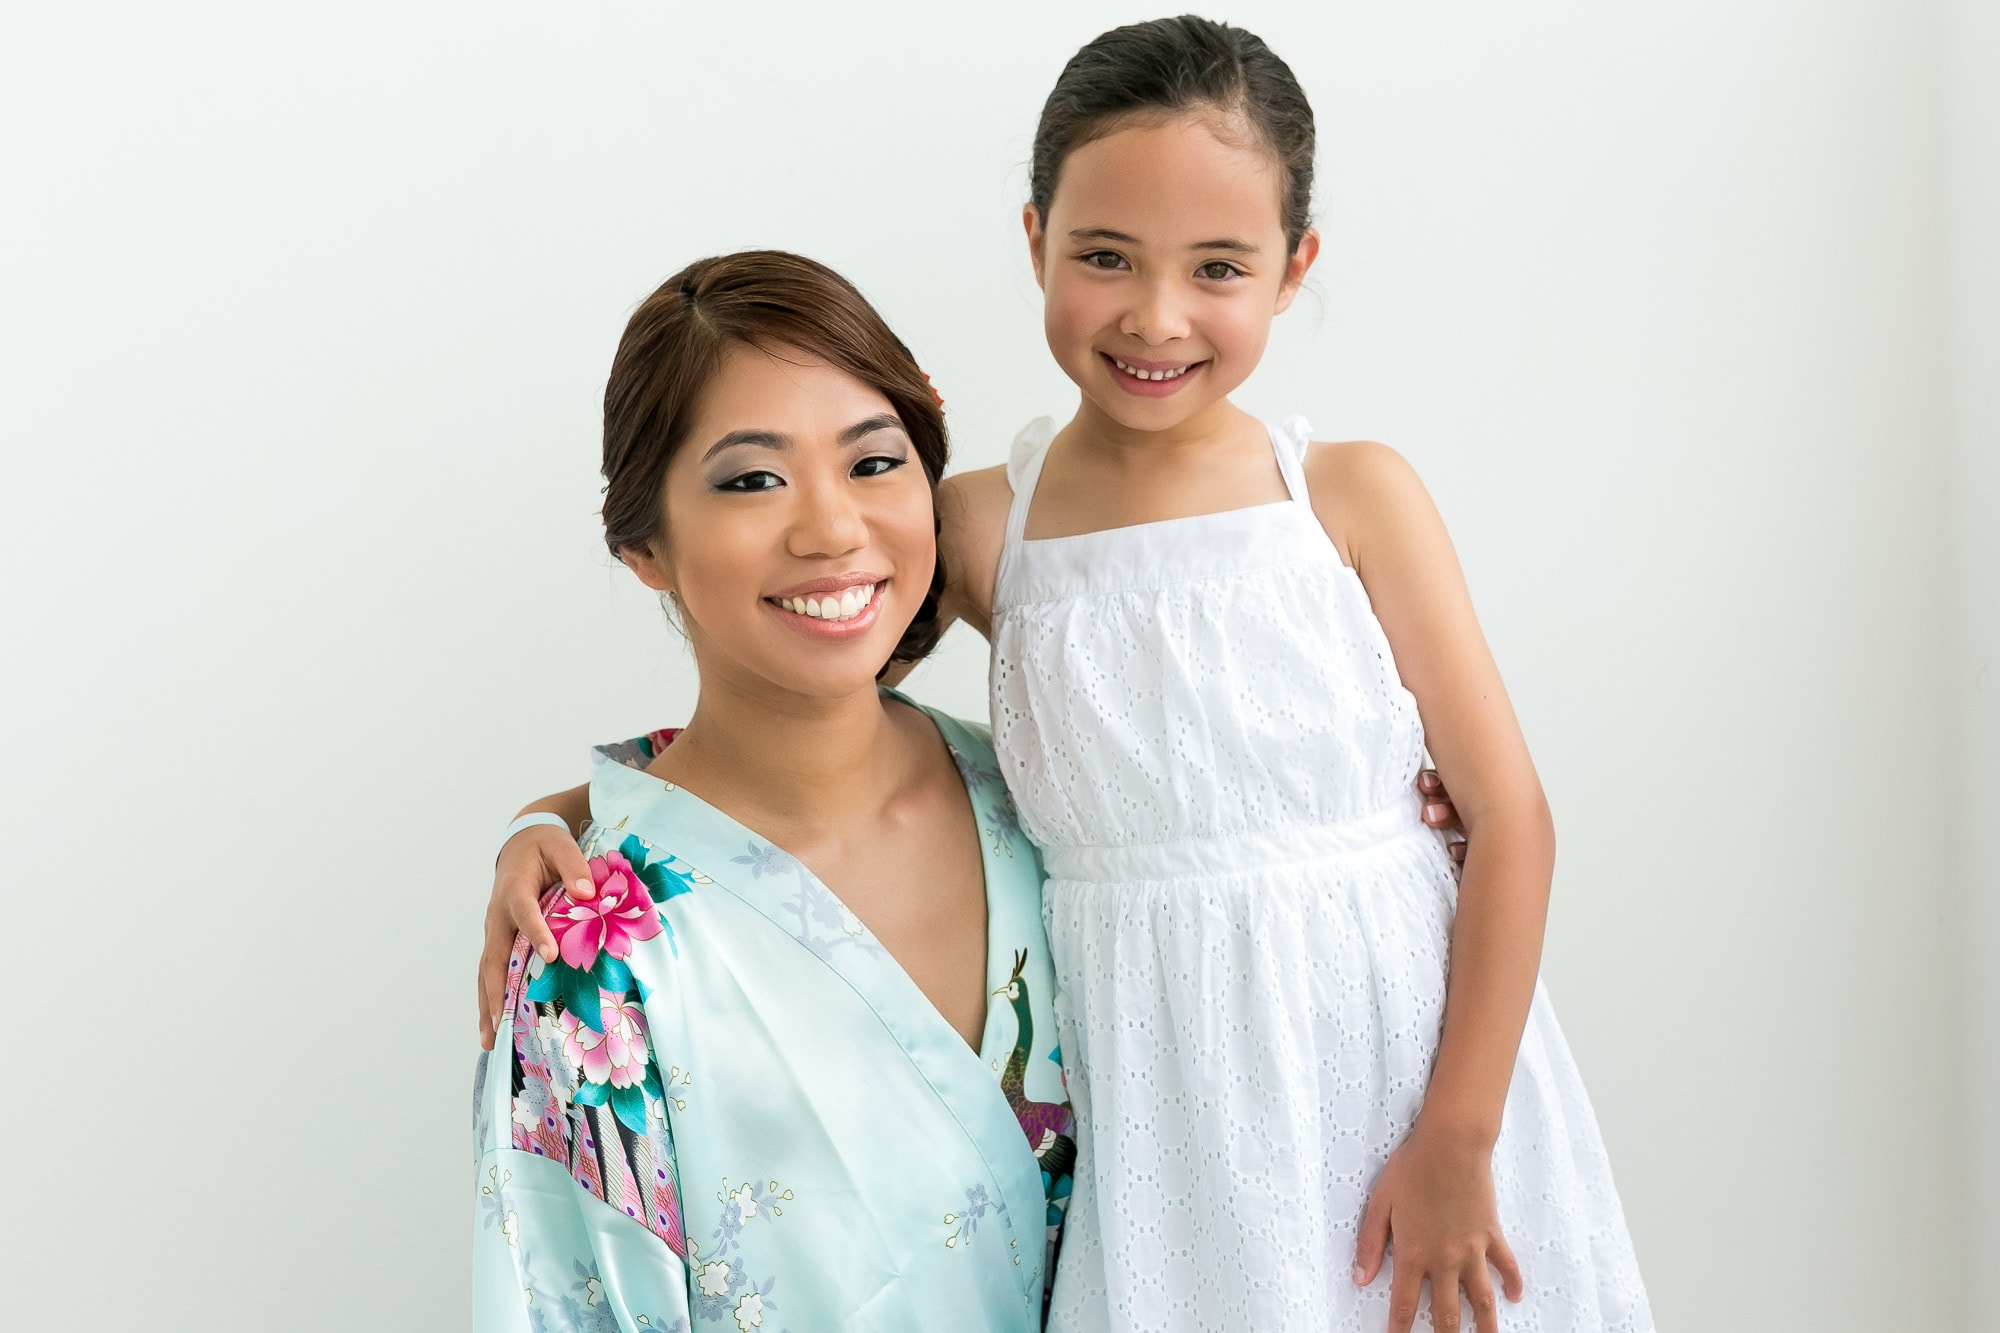 bride with niece before wedding